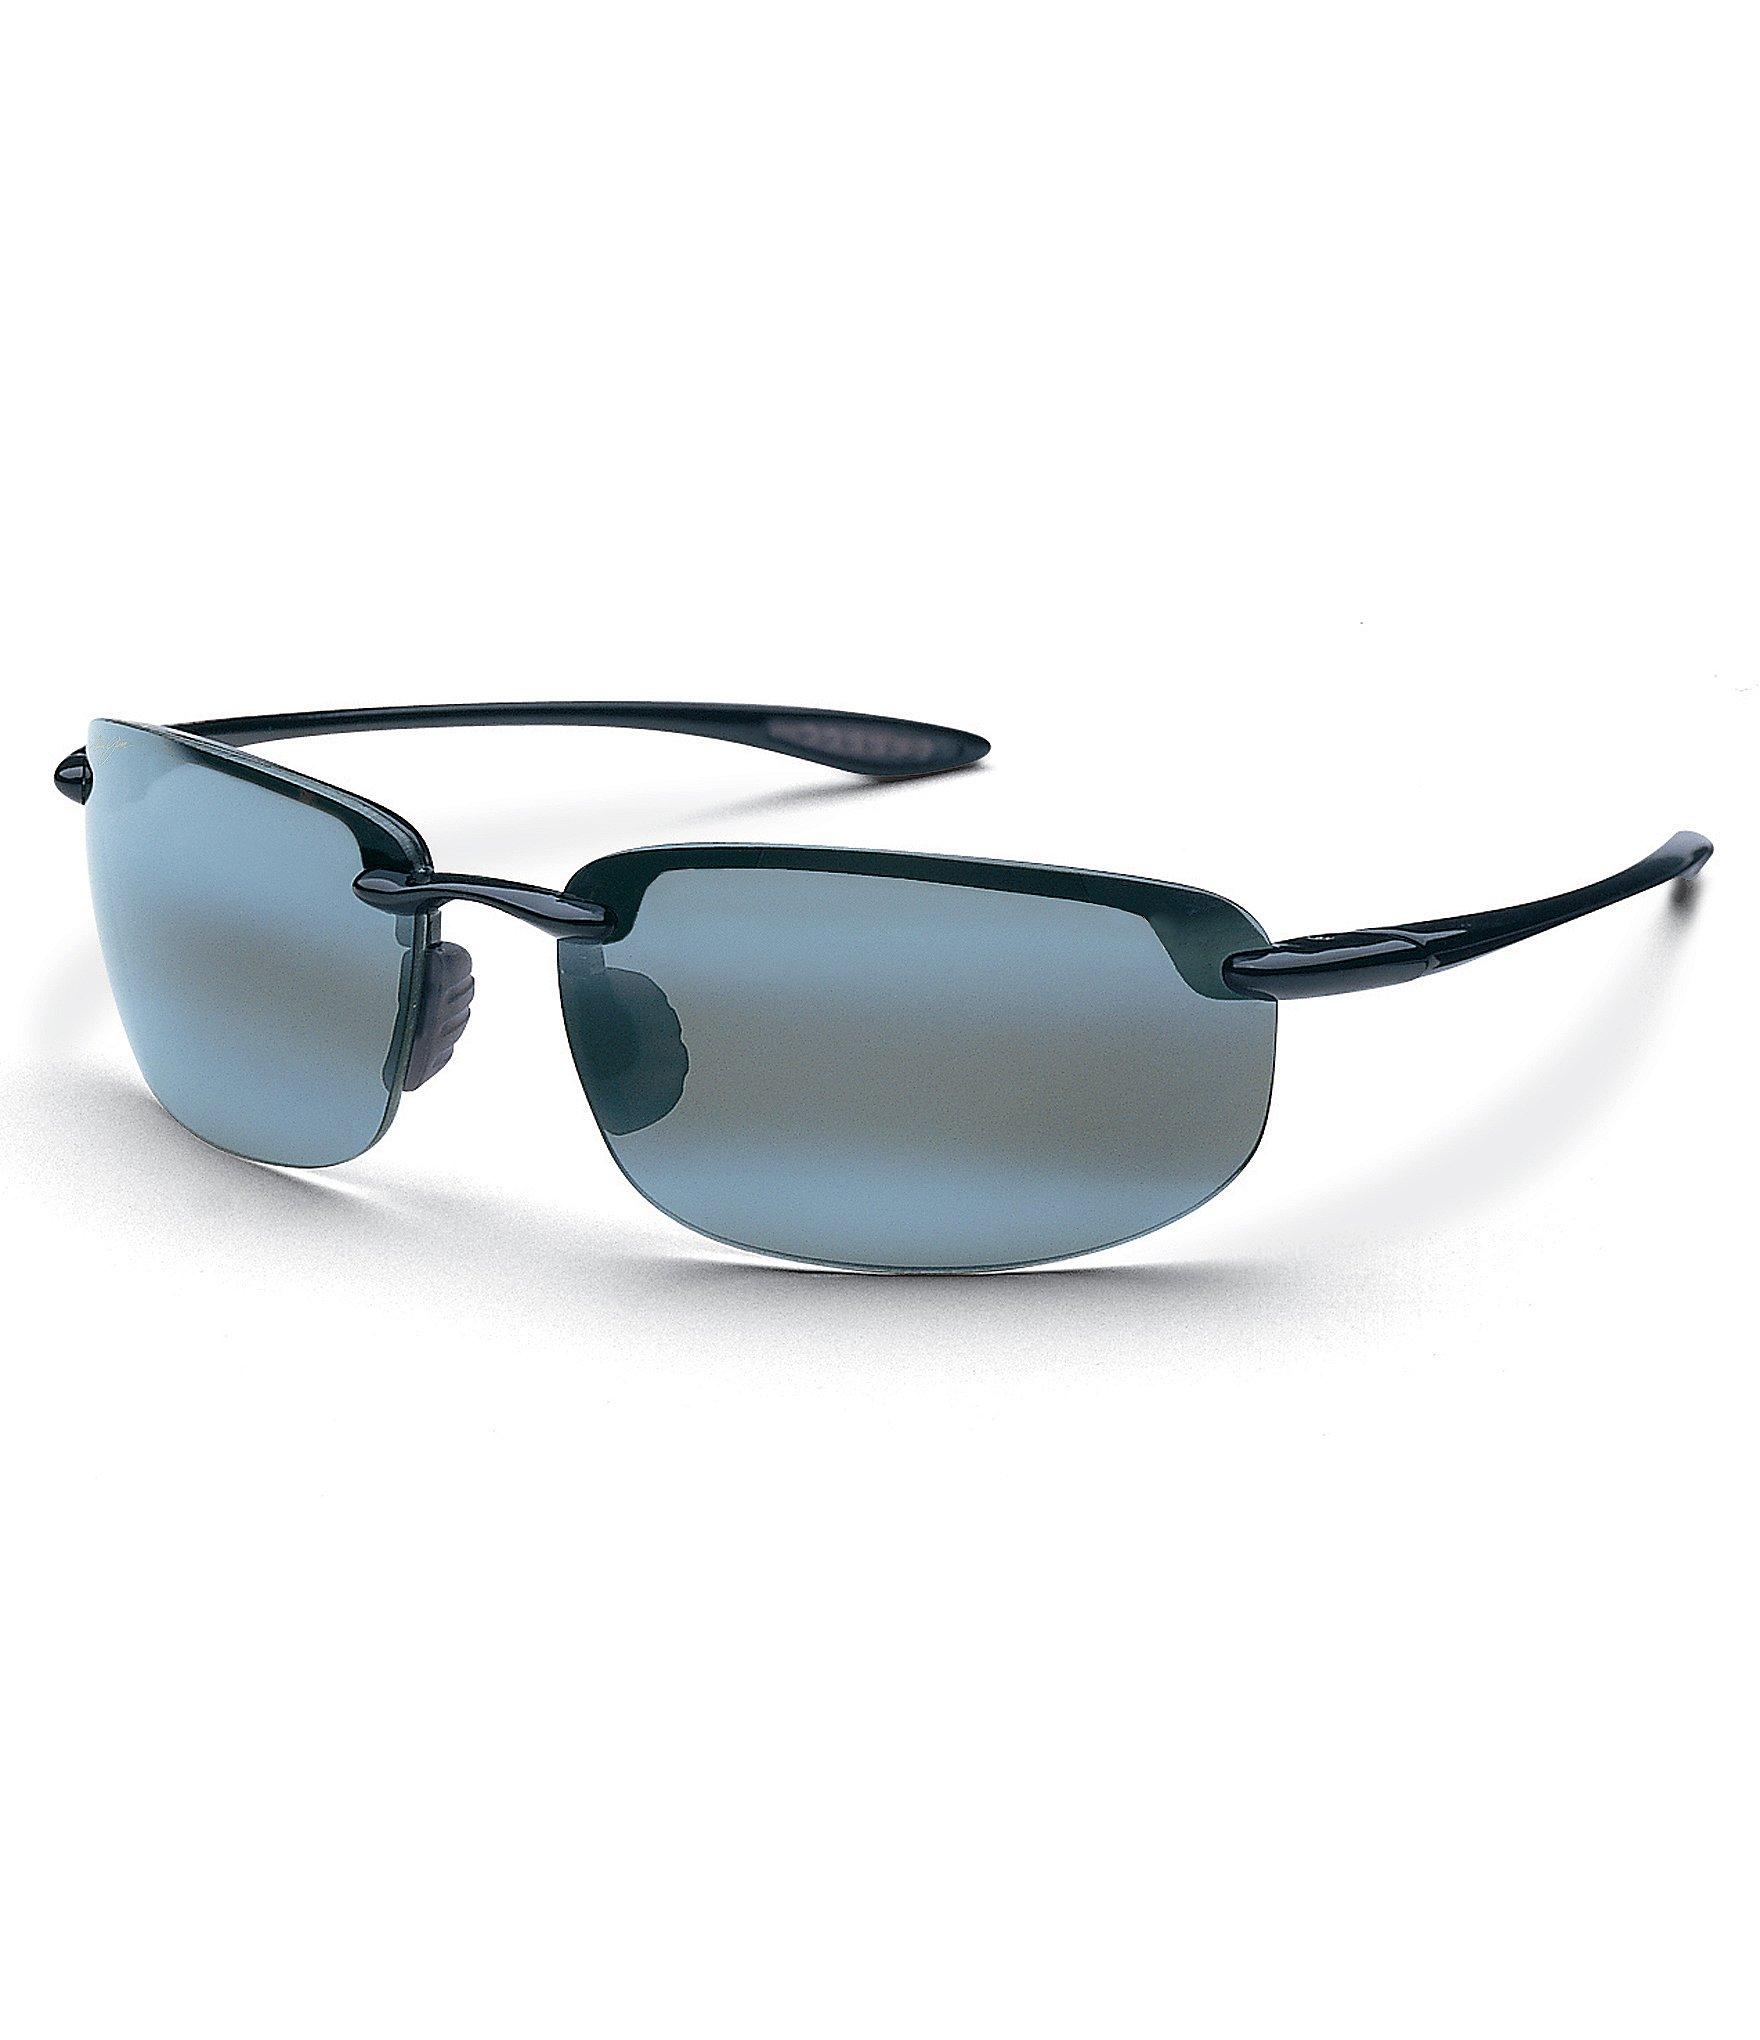 42a6087f89d Maui Jim Ho okipa Polarized Grilamid PolarizedPlus®2 Glare and UV  Protection Sunglasses